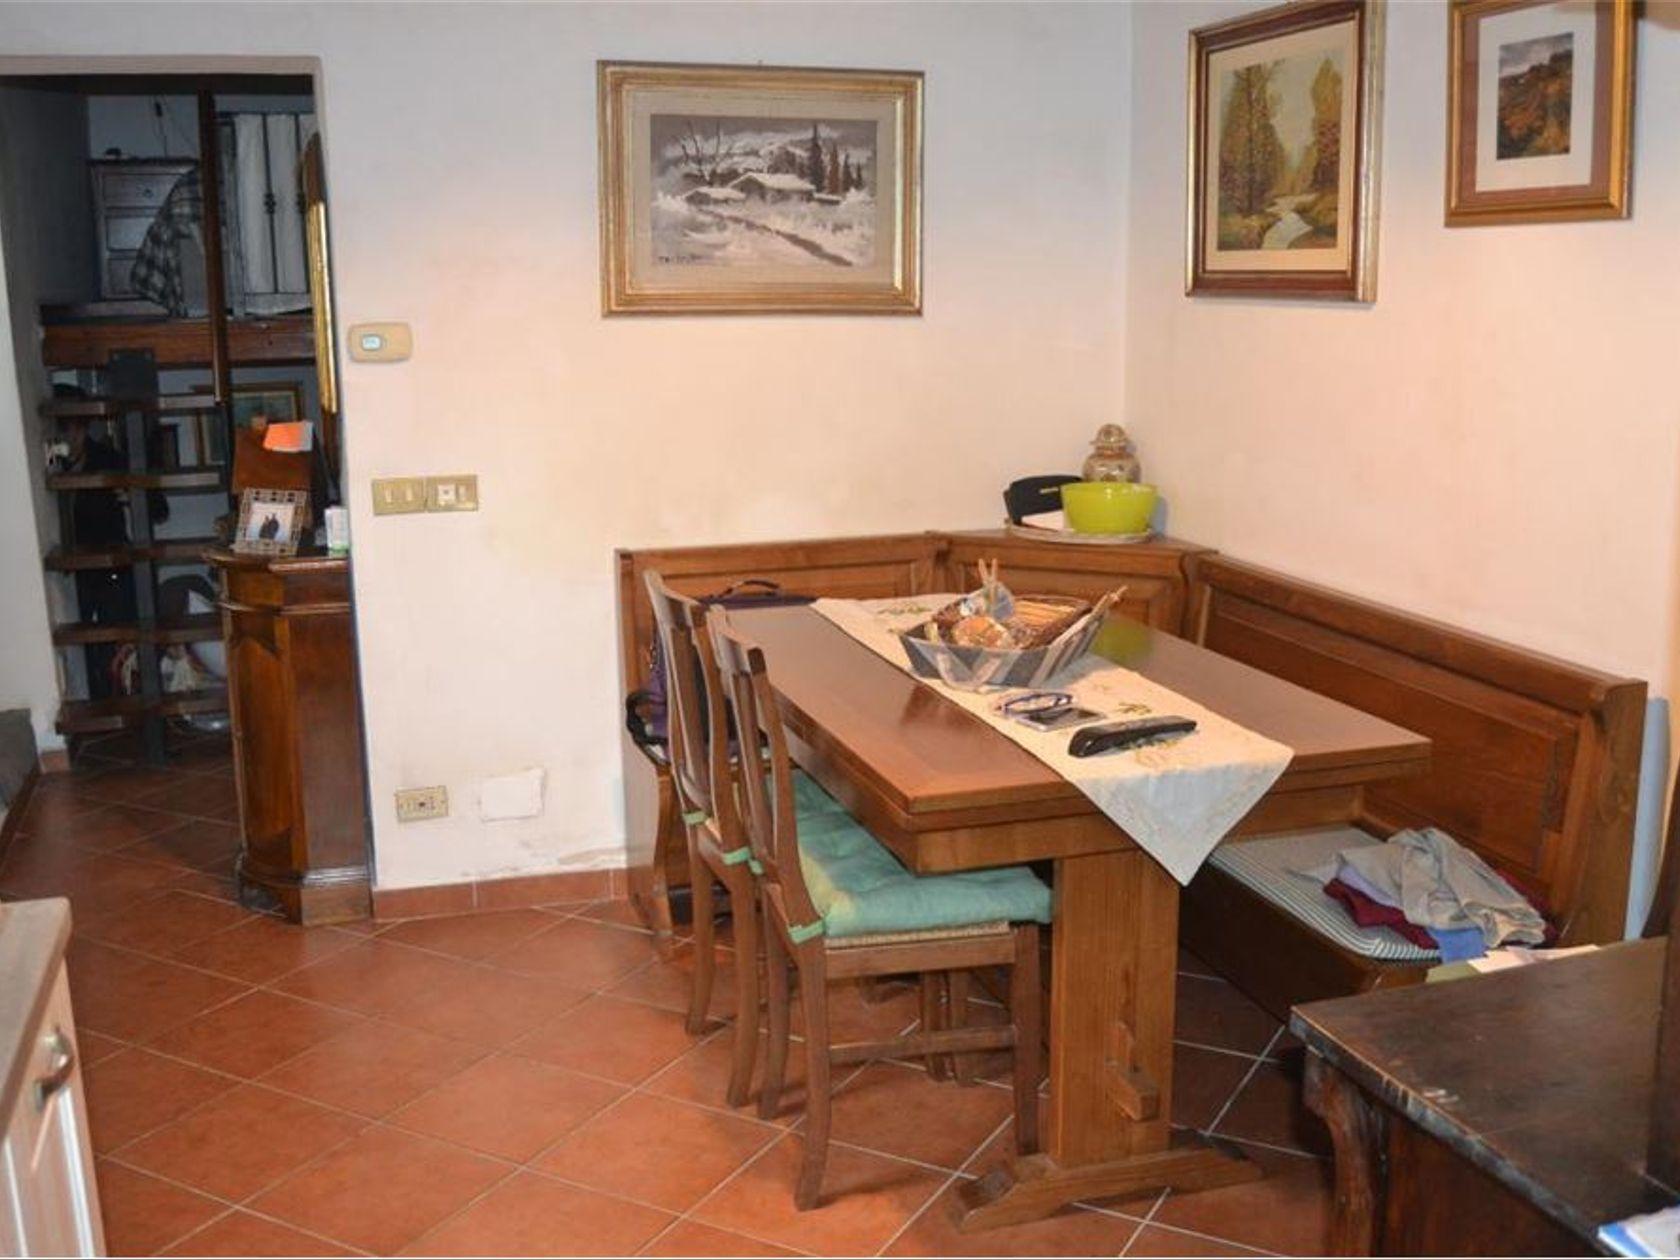 Appartamento Firenze - Firenze Sud Gavinana Europa, Firenze, FI Vendita - Foto 9